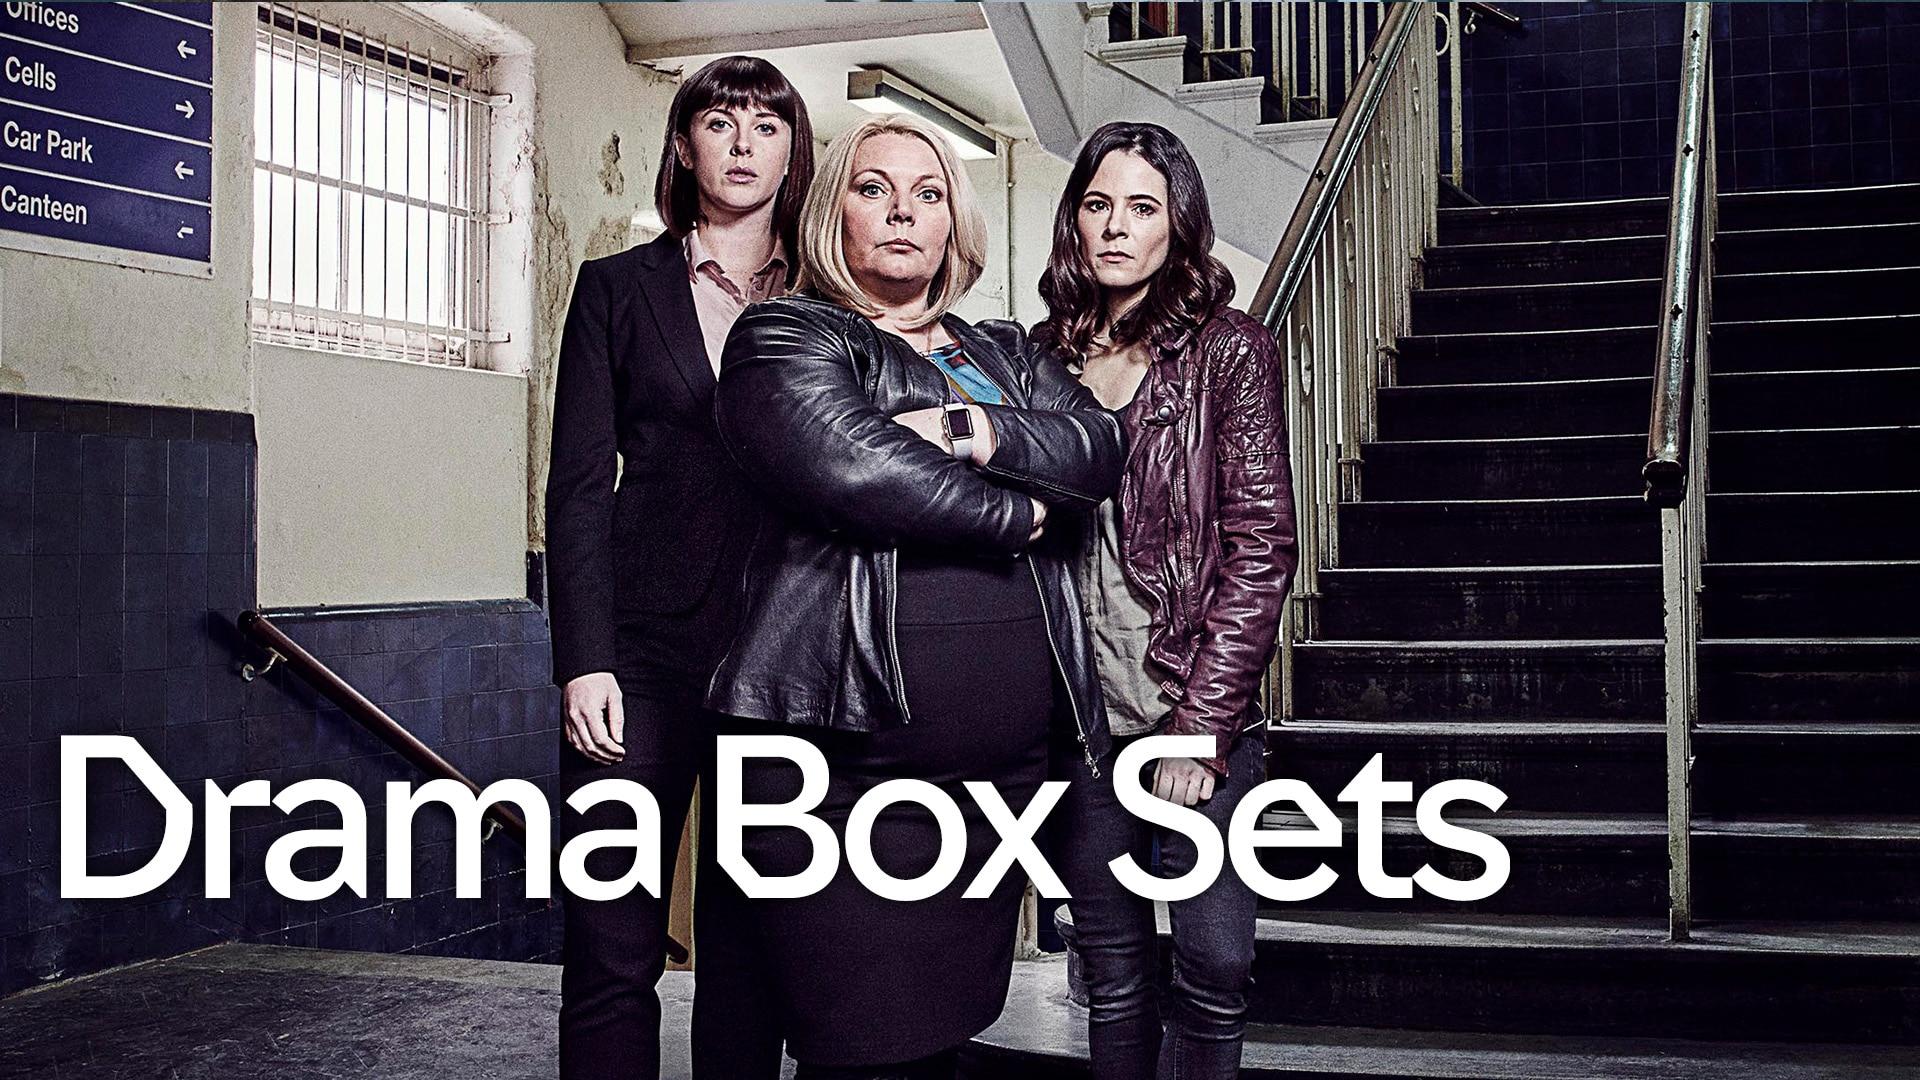 Drama Box Sets